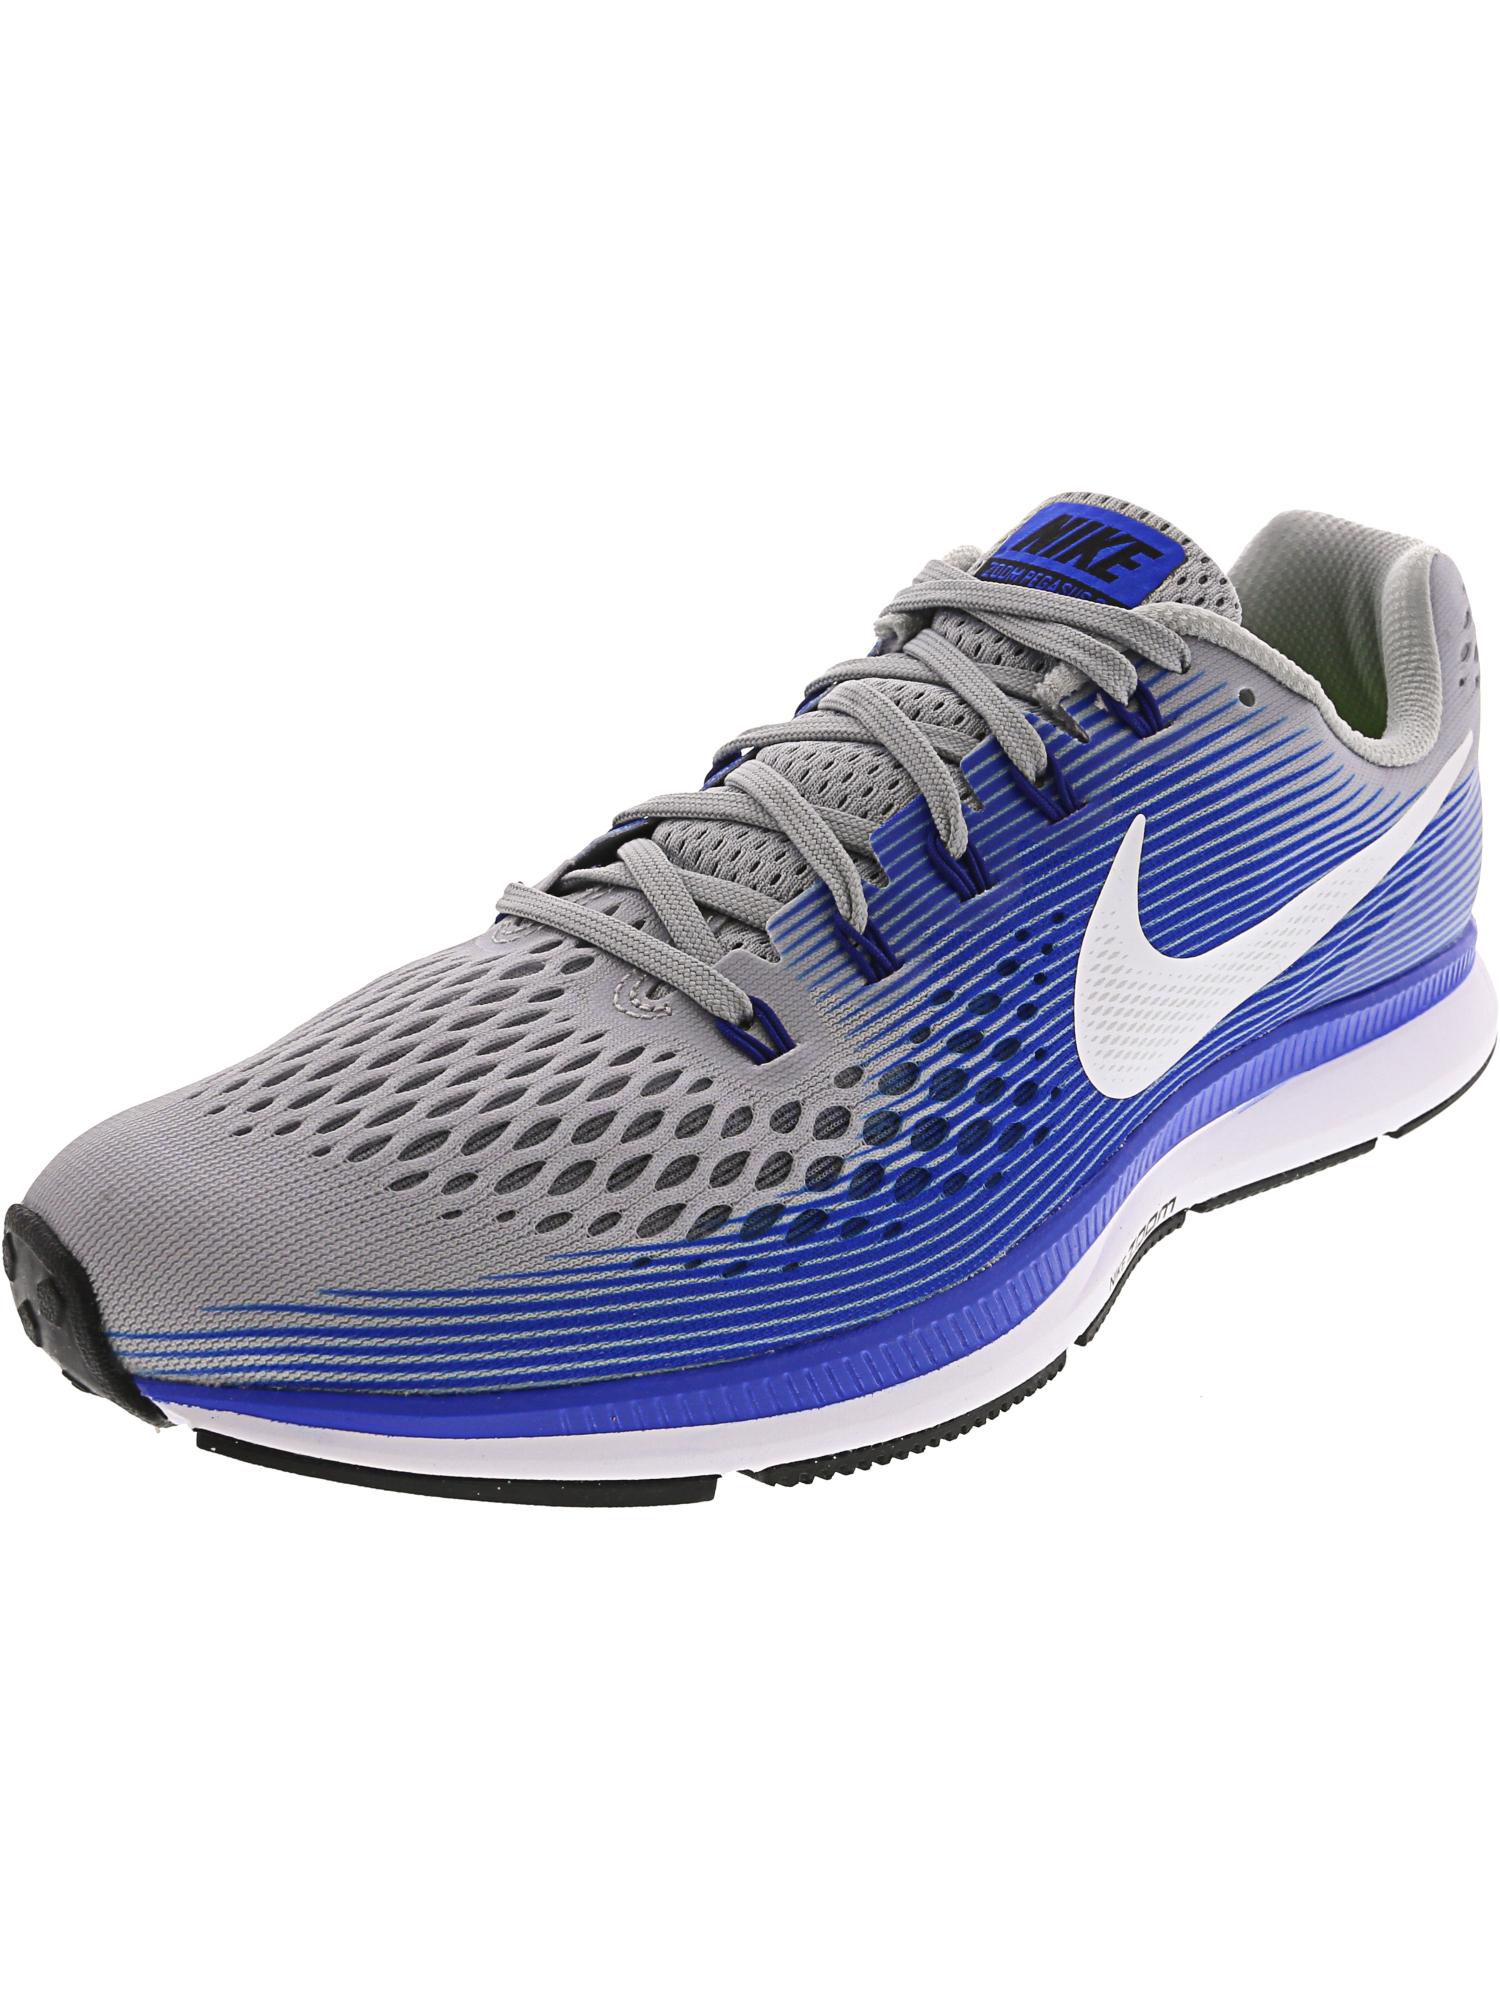 0b86d4e1fd20 Nike Men s Air Zoom Pegasus 34 Ankle-High Running Shoe